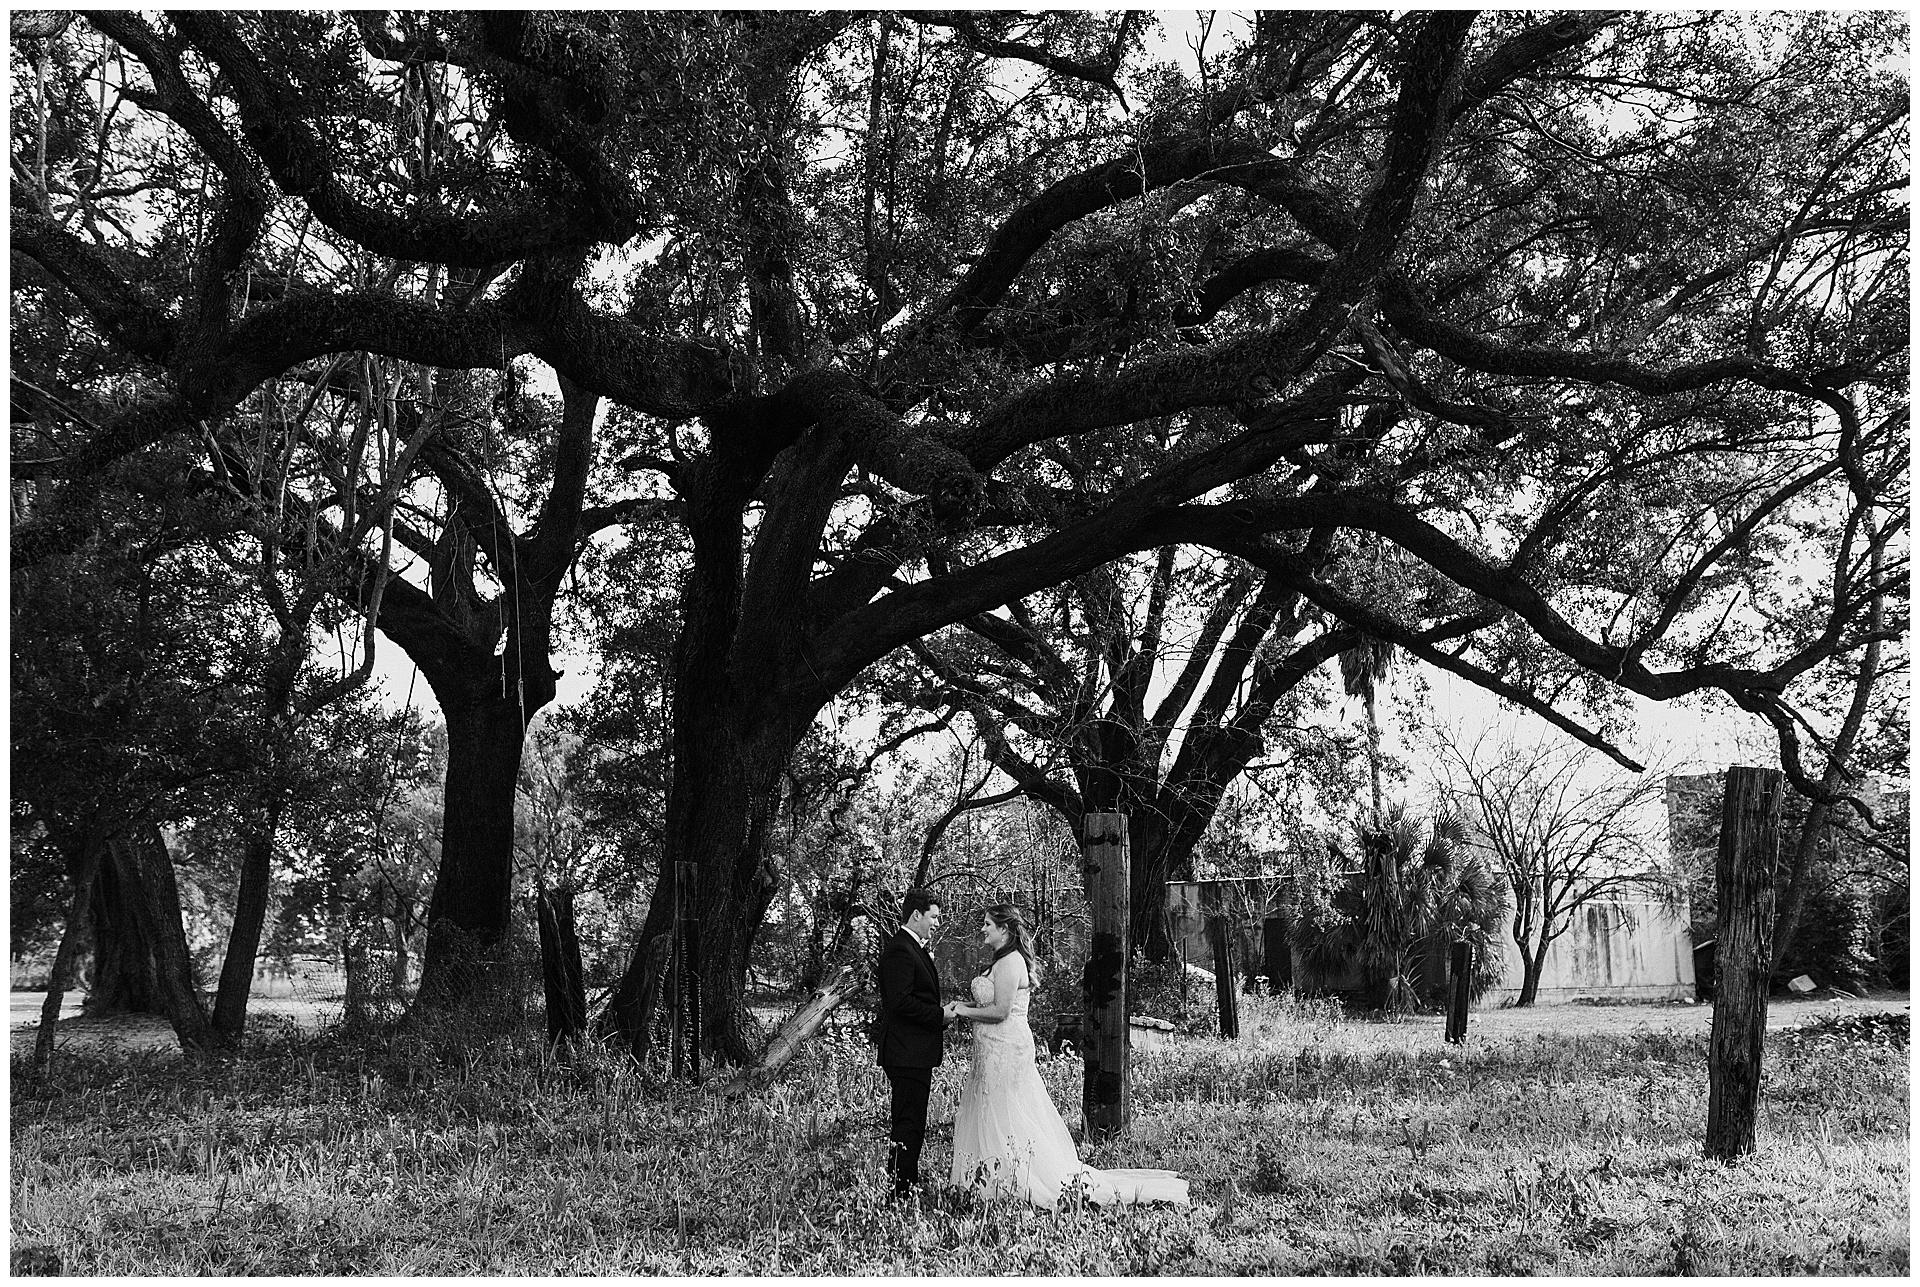 treaty oak glass factory wedding_mia dimare photography16.jpg